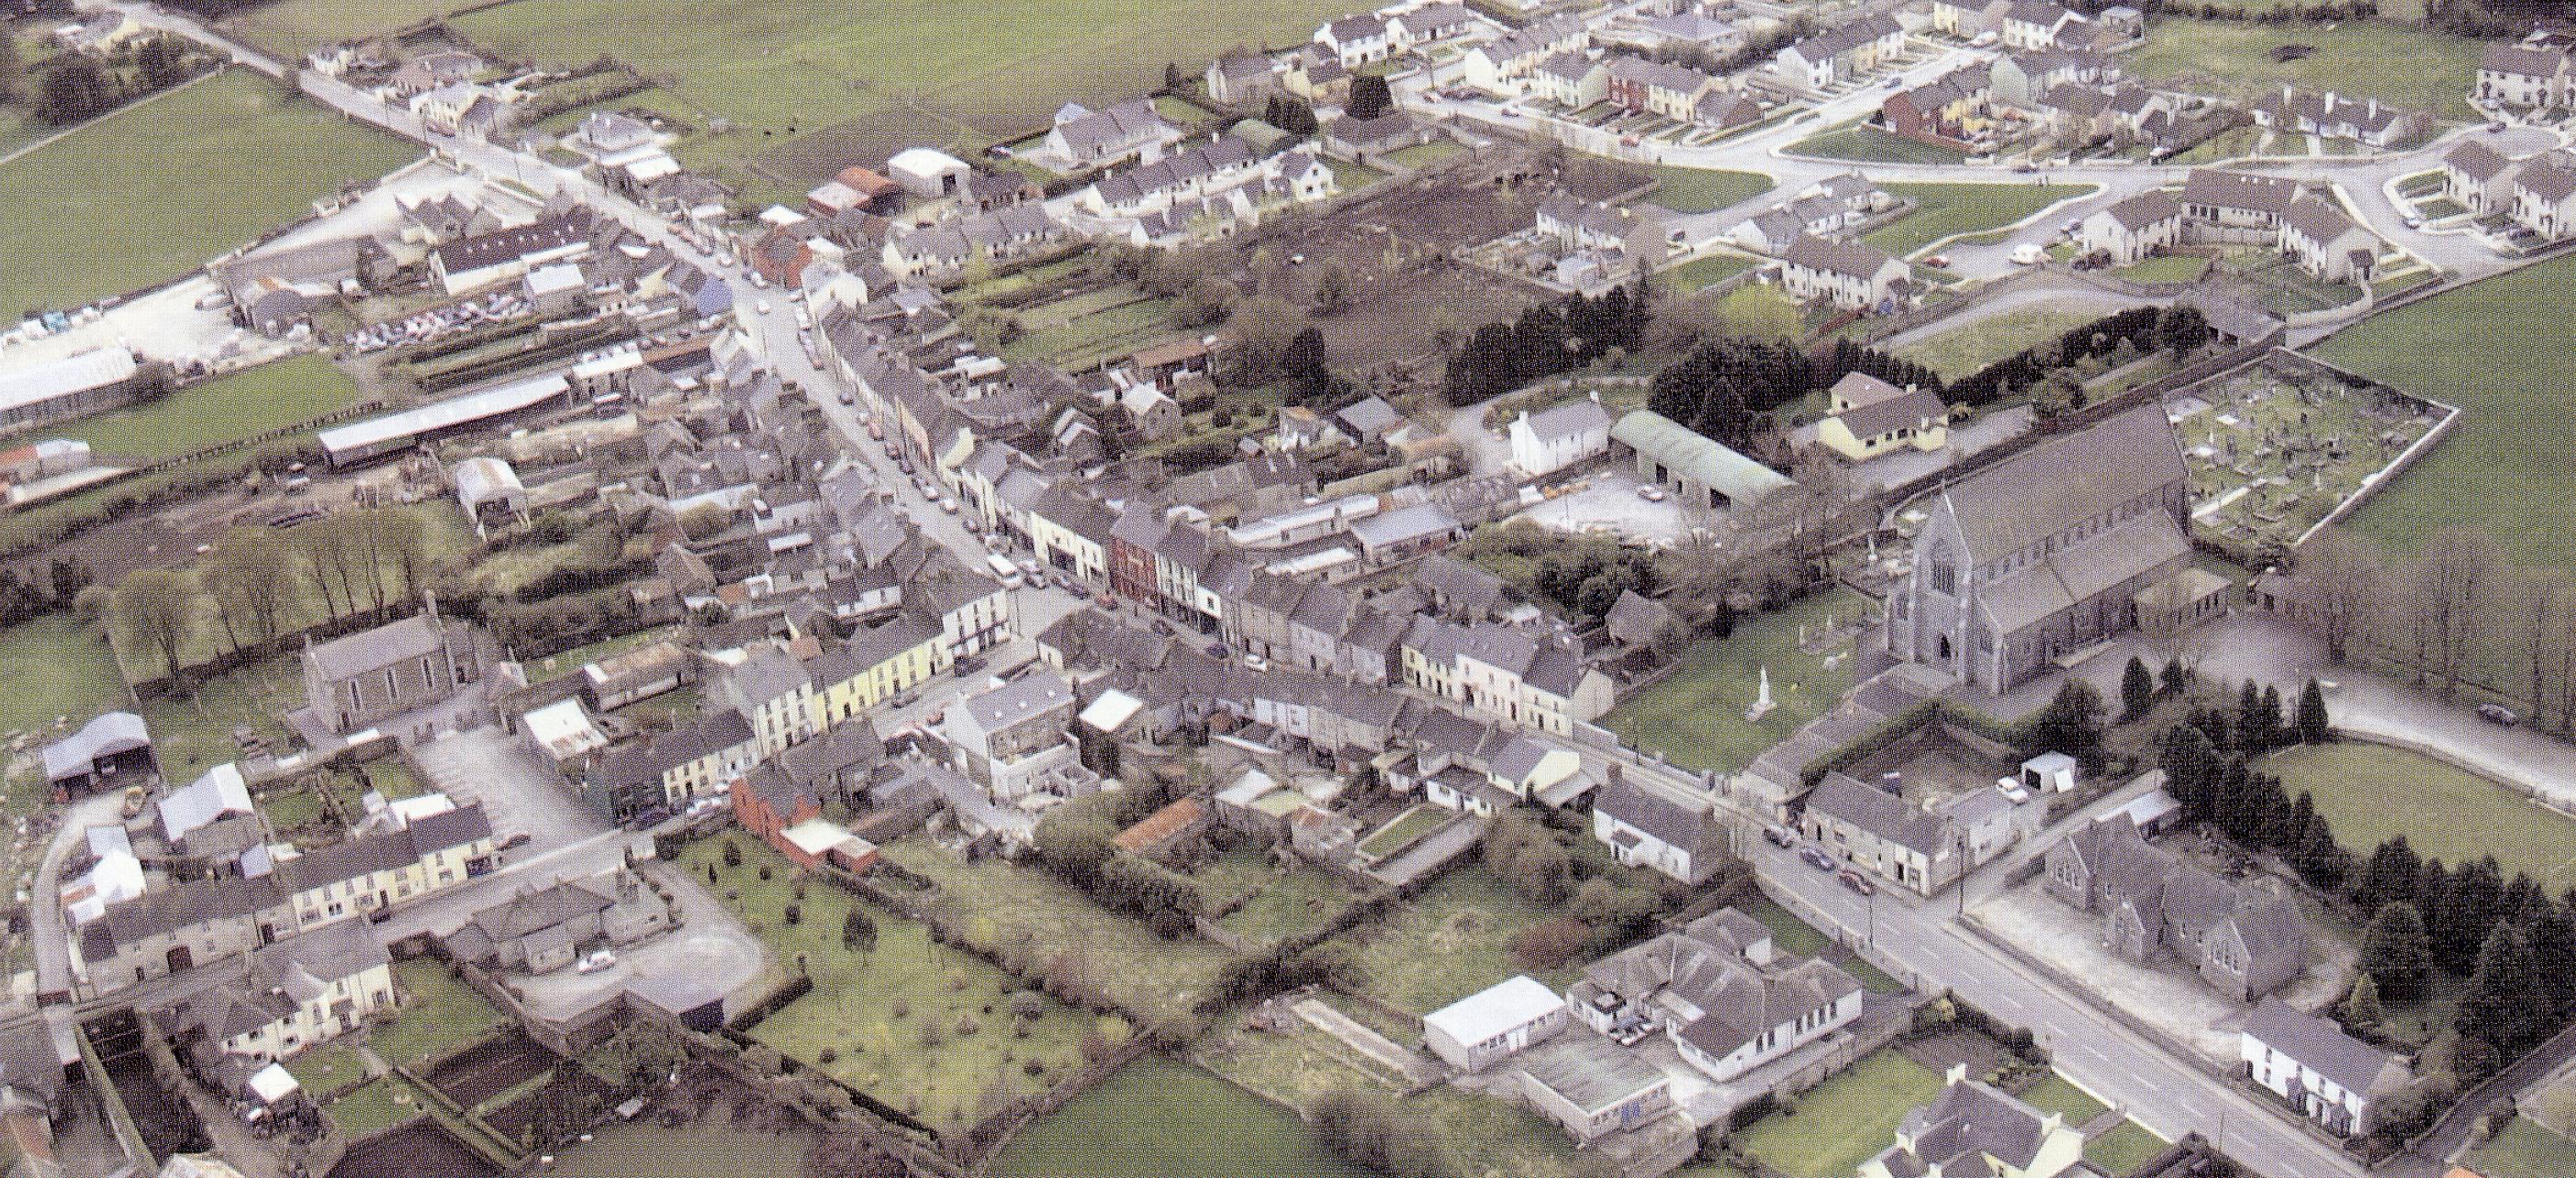 Tipperary GAA | Tipperary GAA news including Hurling, Gaelic